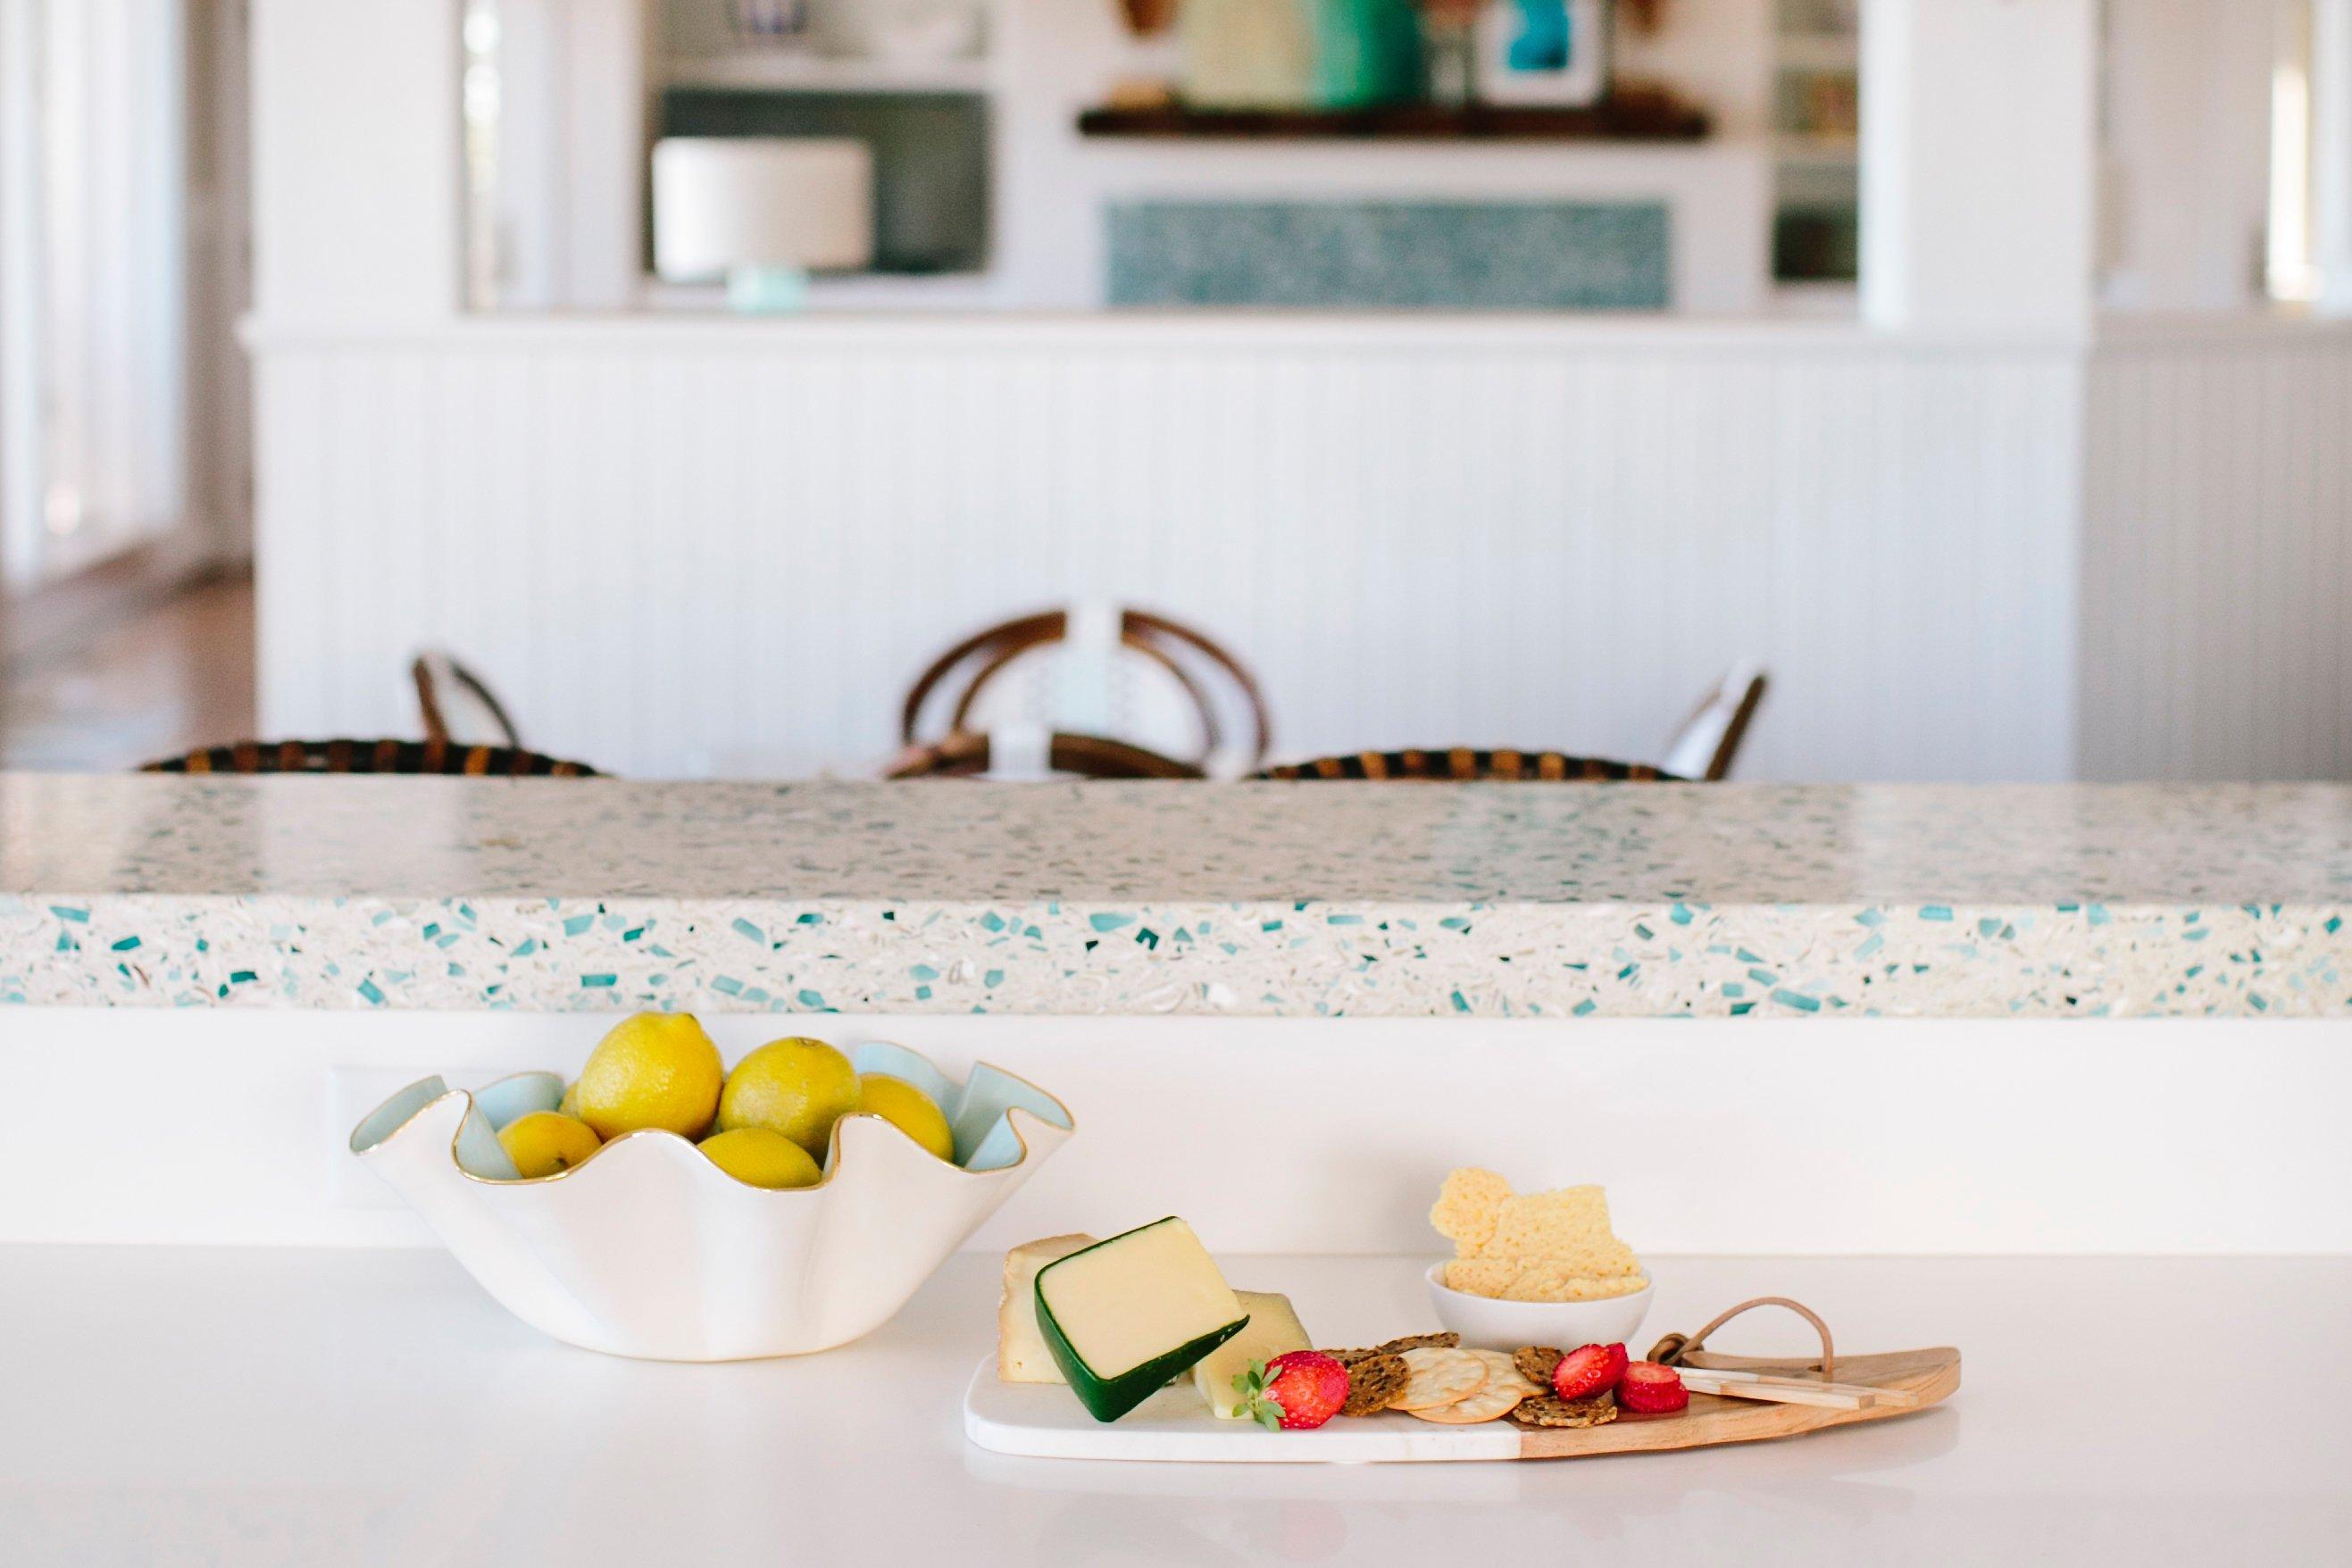 Vetrazzo-Recycled-Glass-Bretagne-Blue-Kitchen-Countertops-Gathered-Design-3